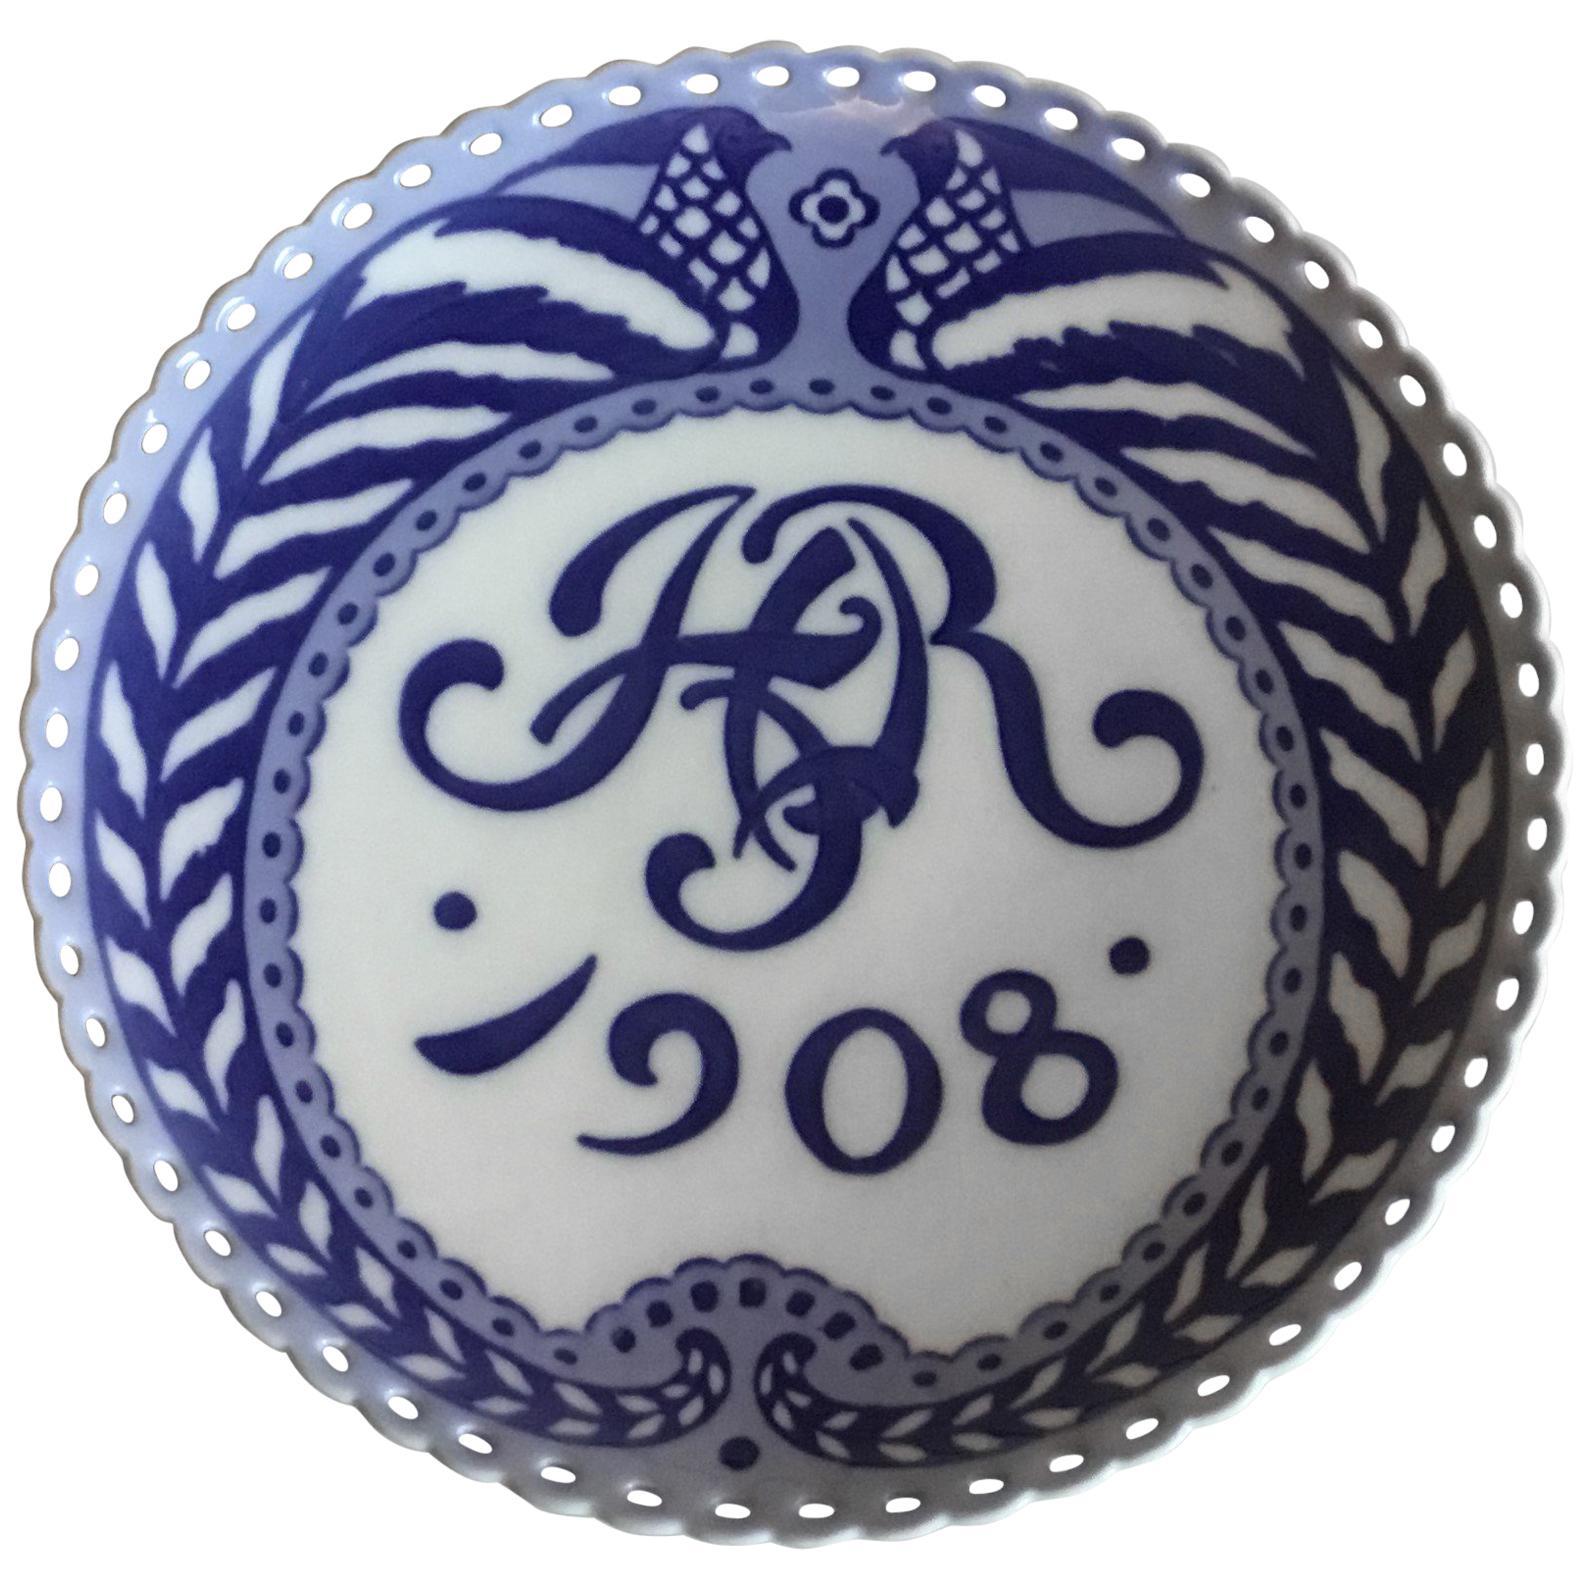 Royal Copenhagen Commemorative Plate from 1908 RC-CM83